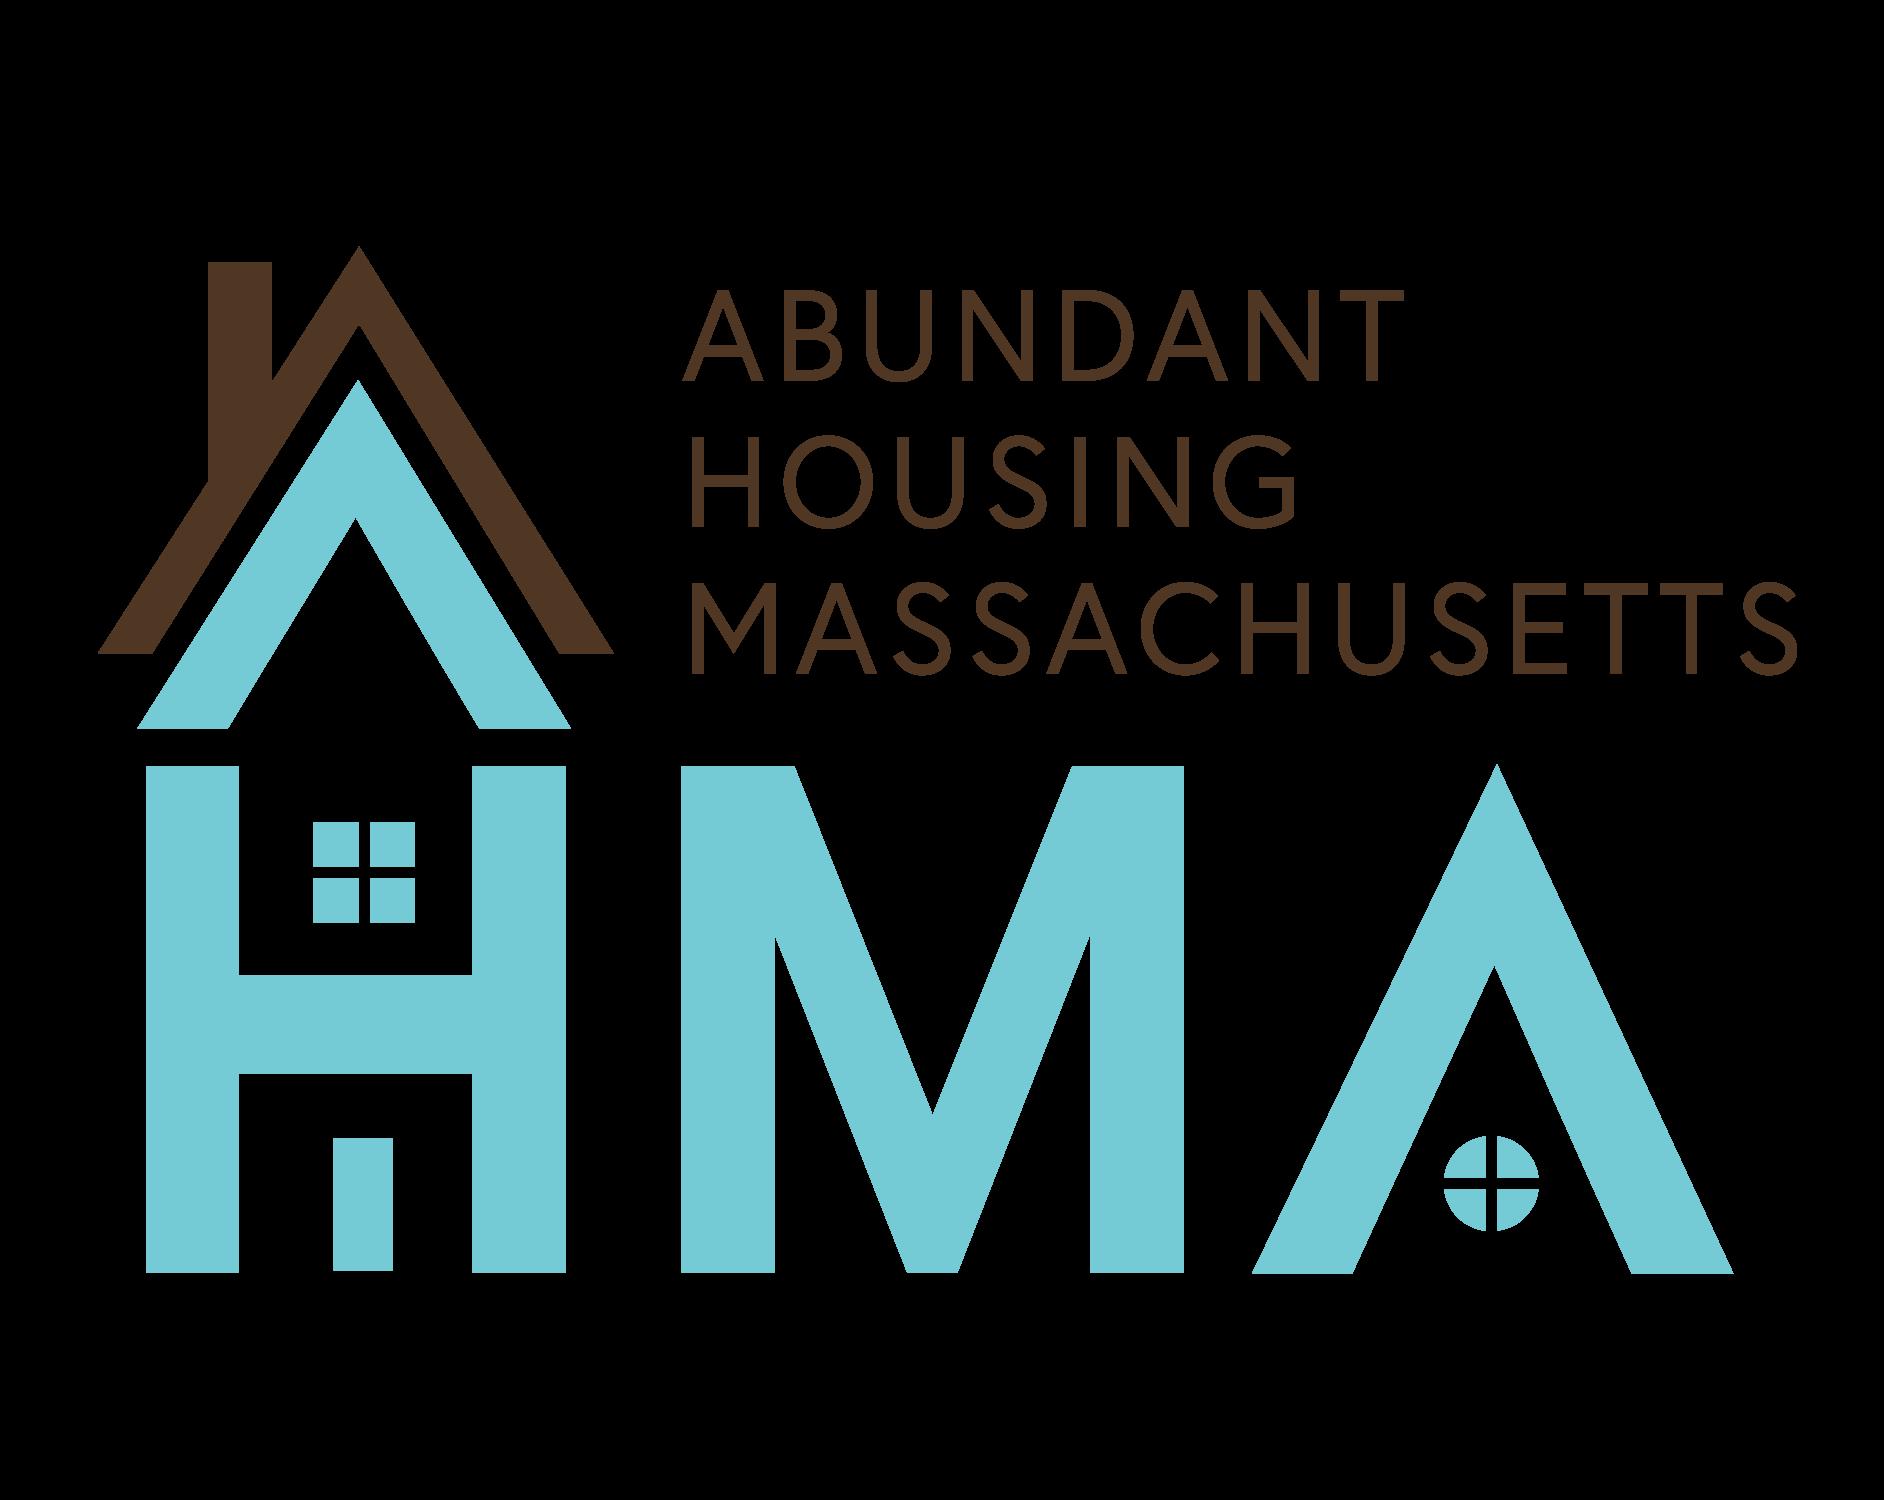 Abundant Housing Massachusetts